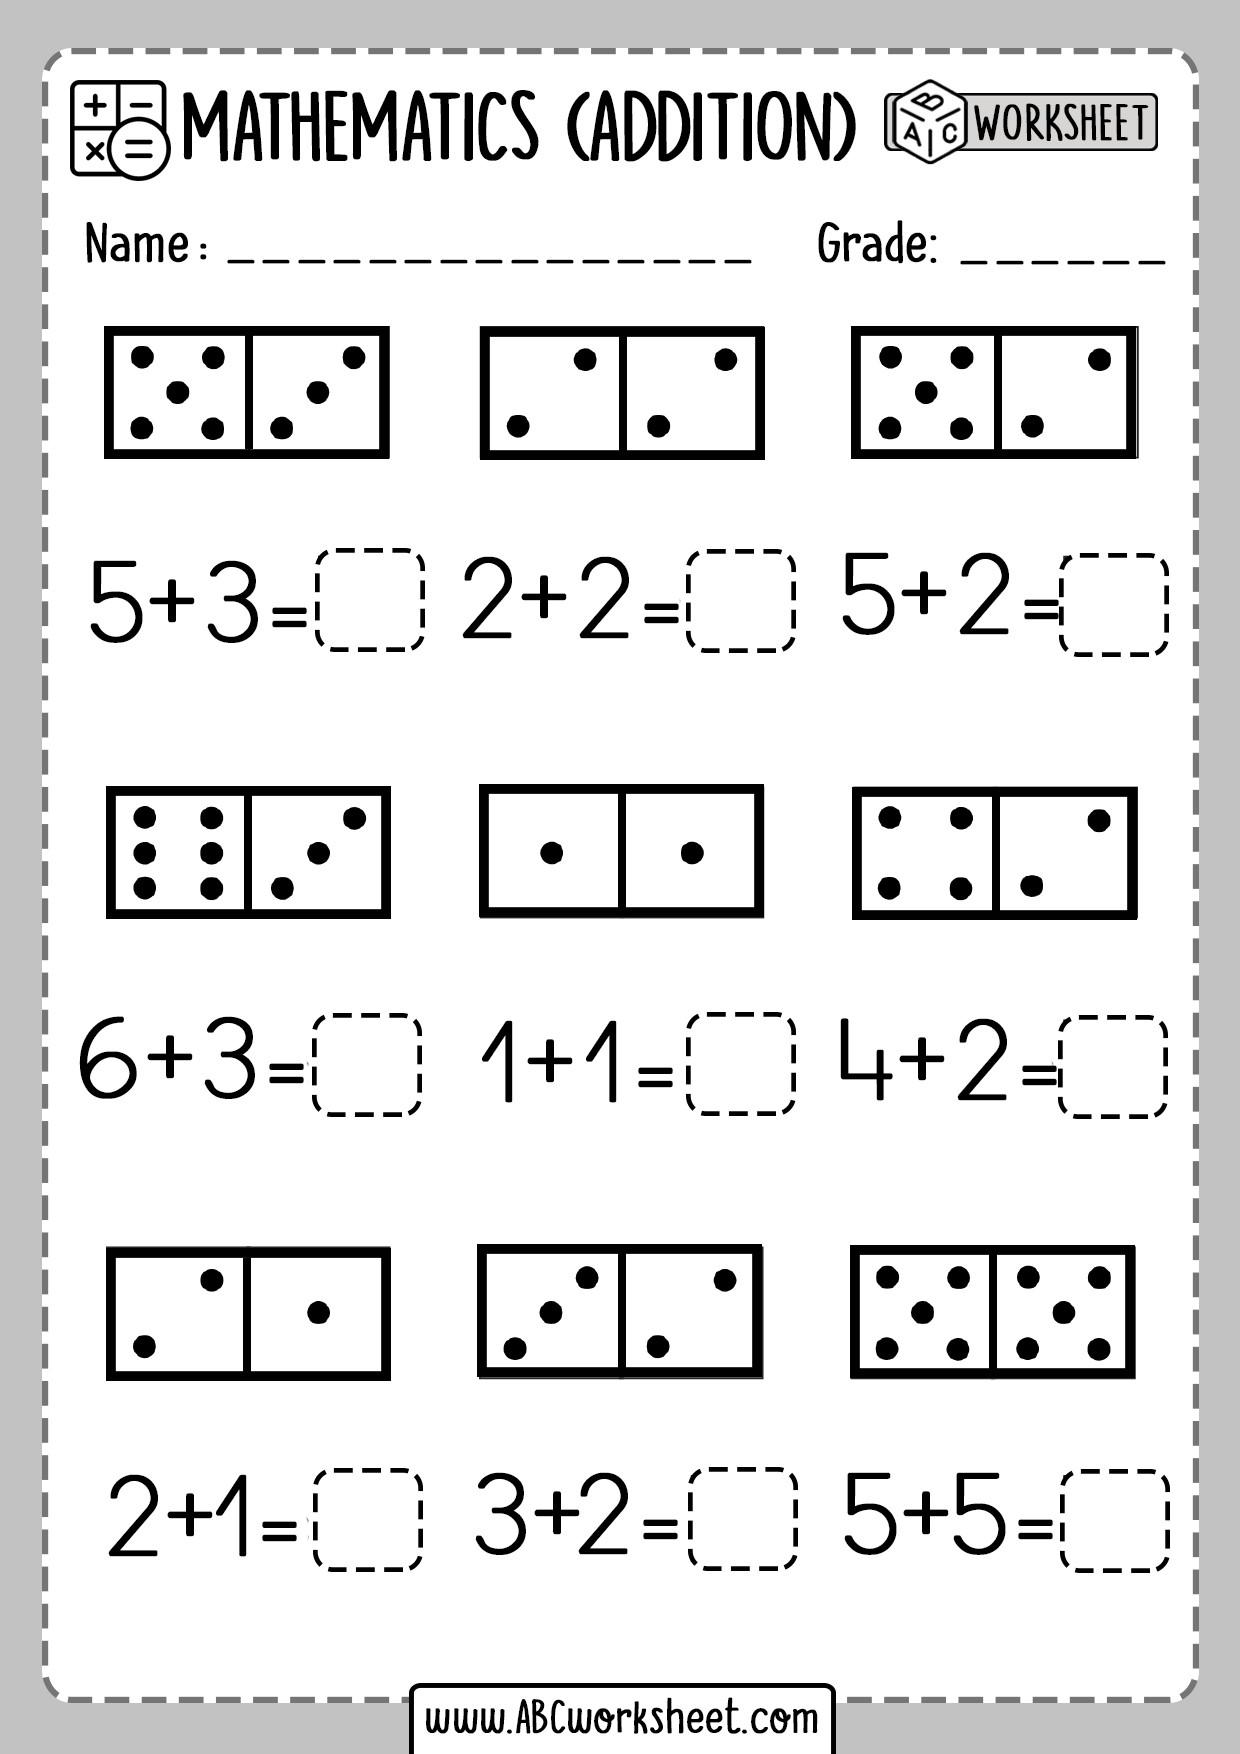 Kindergarten Math Worksheet Pdf Worksheets Worksheets Printable Kindergartenath Free